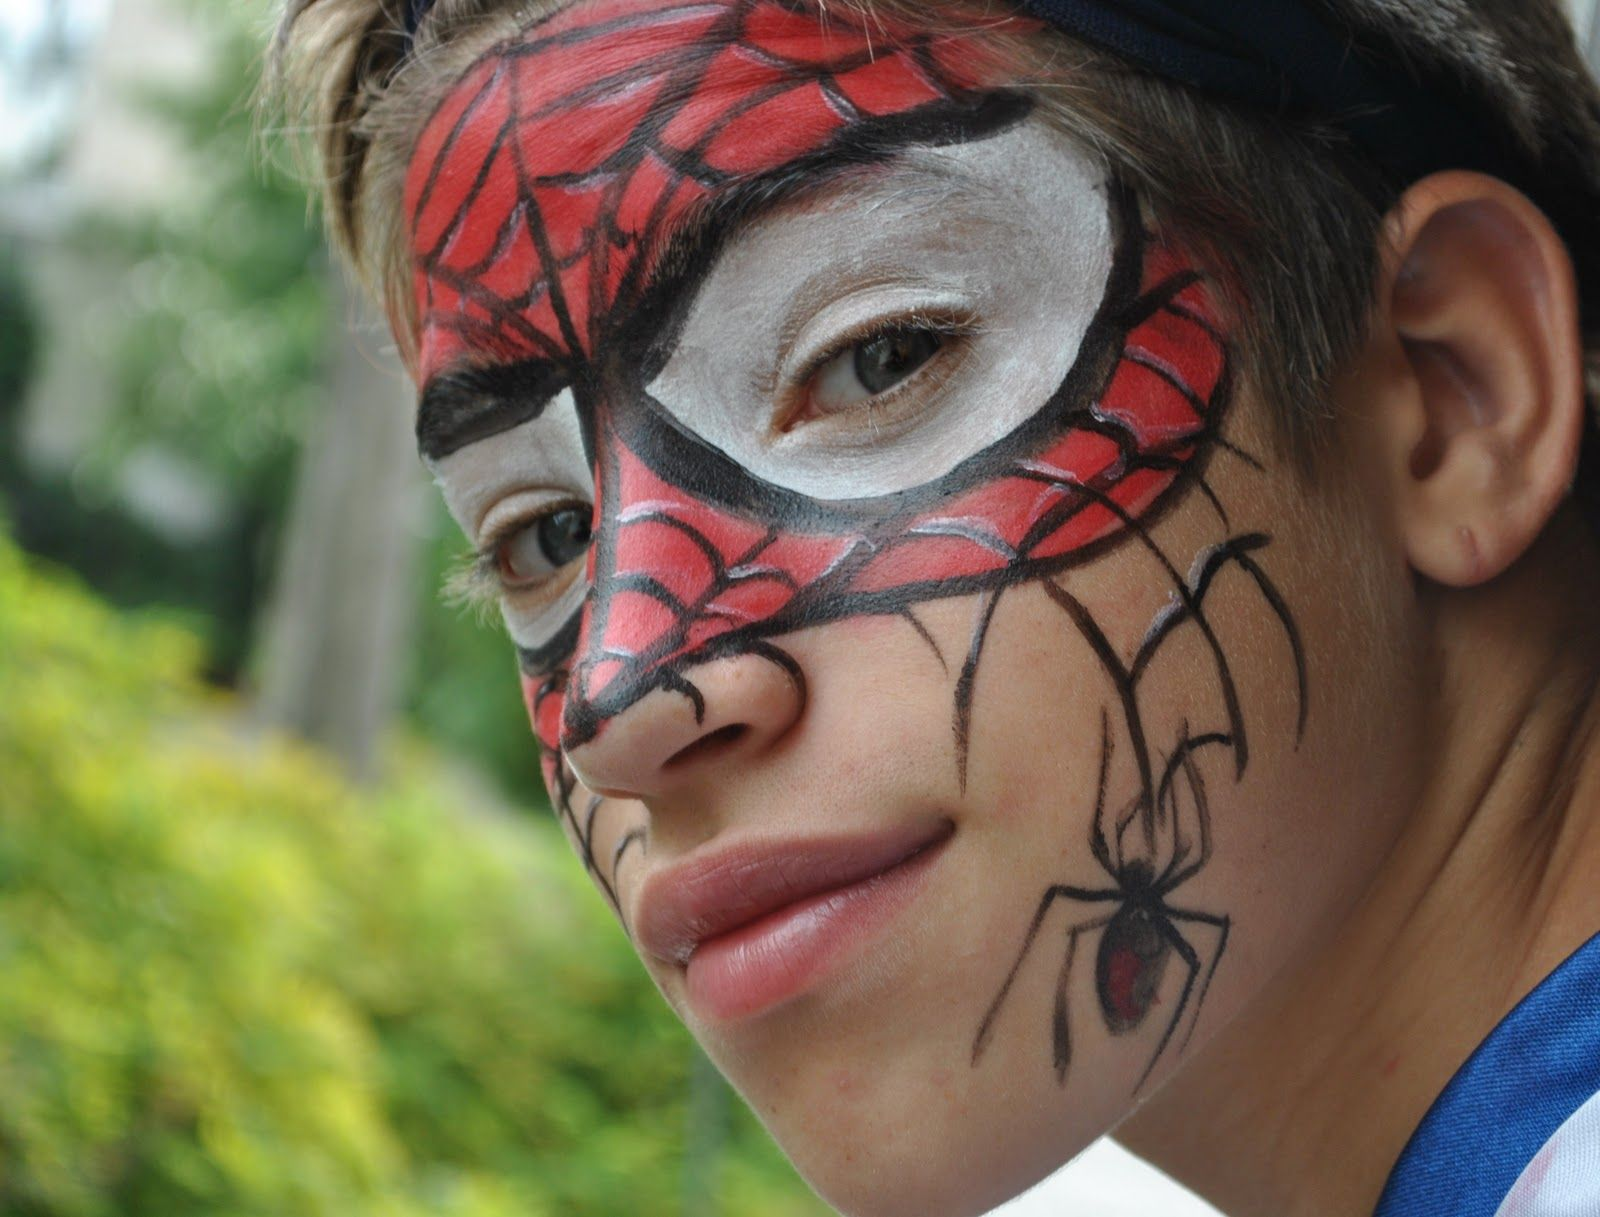 Pin de lourdez gomez en maquillaje artistico | Halloween ...